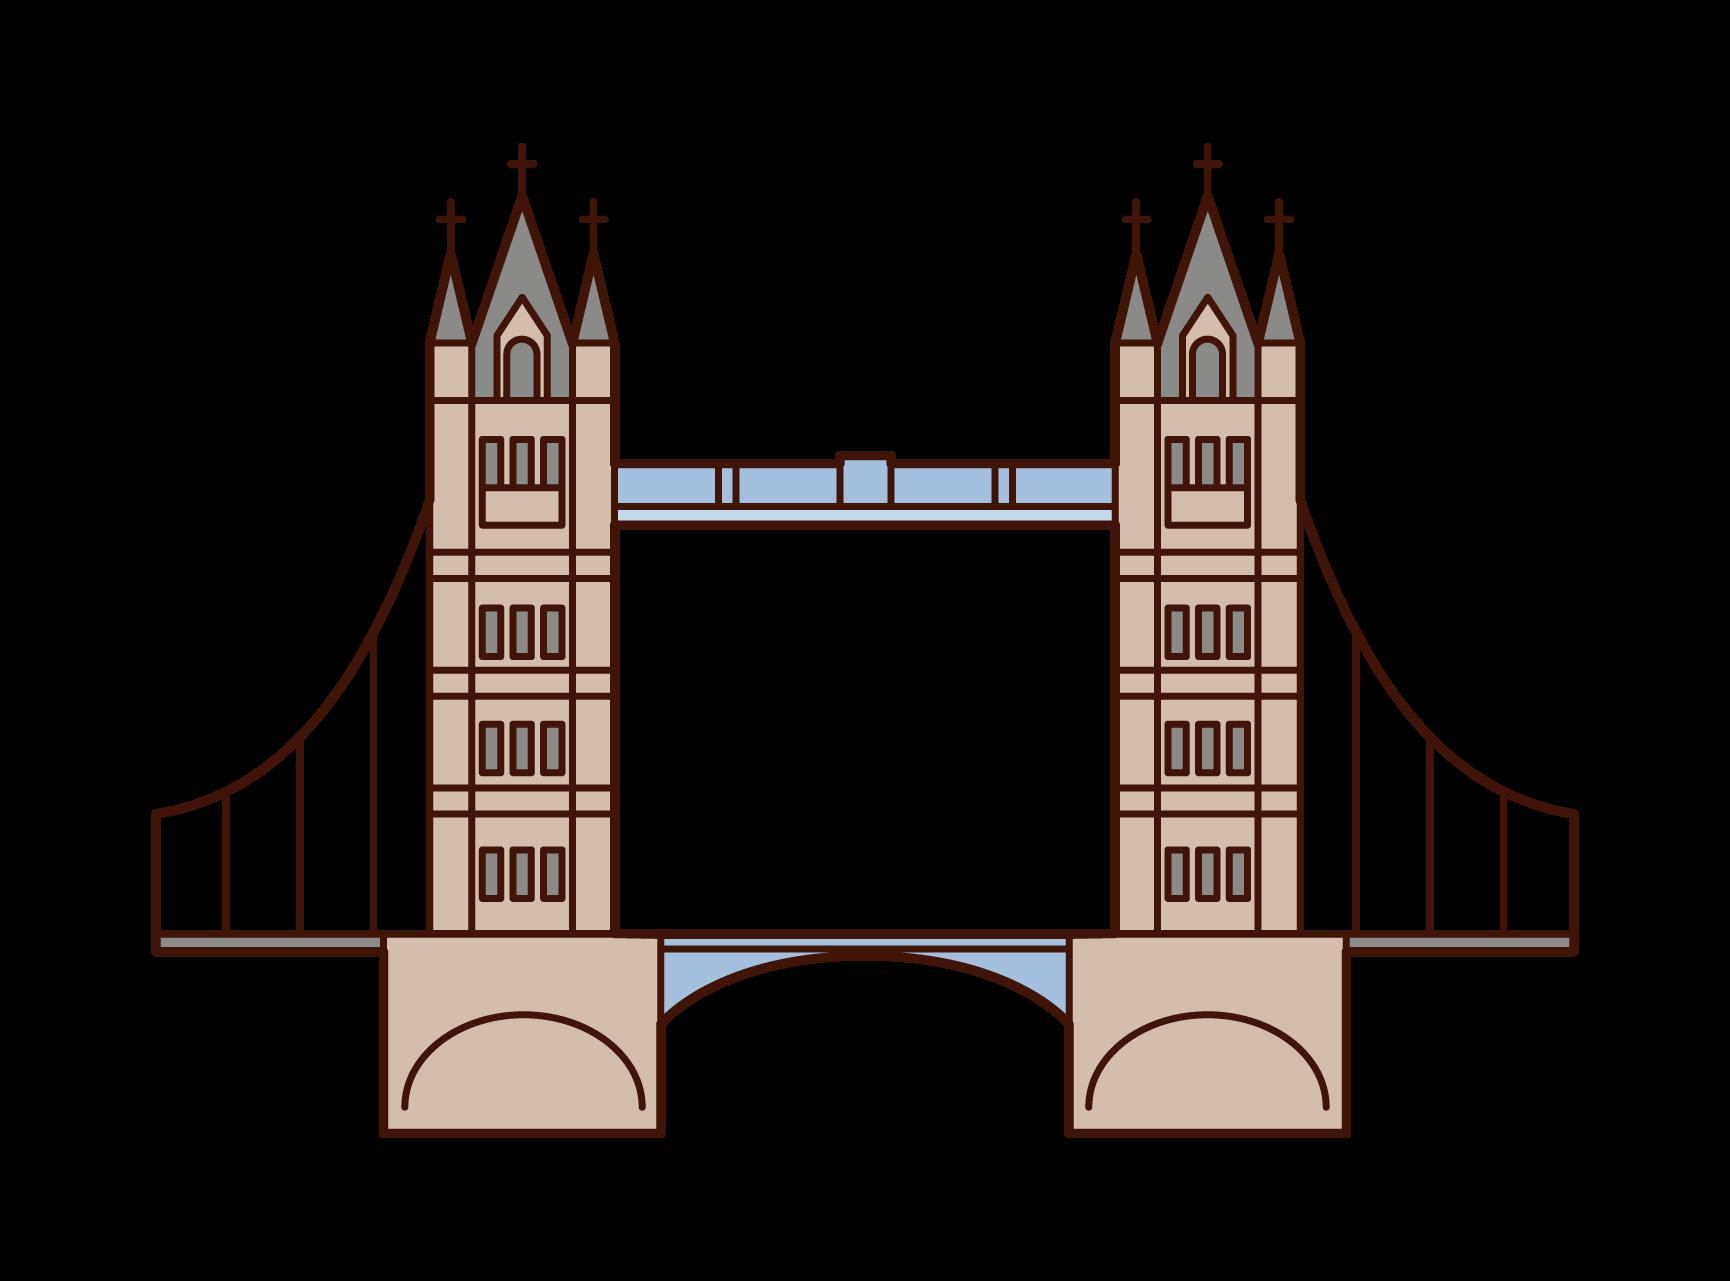 Illustration of Tower Bridge